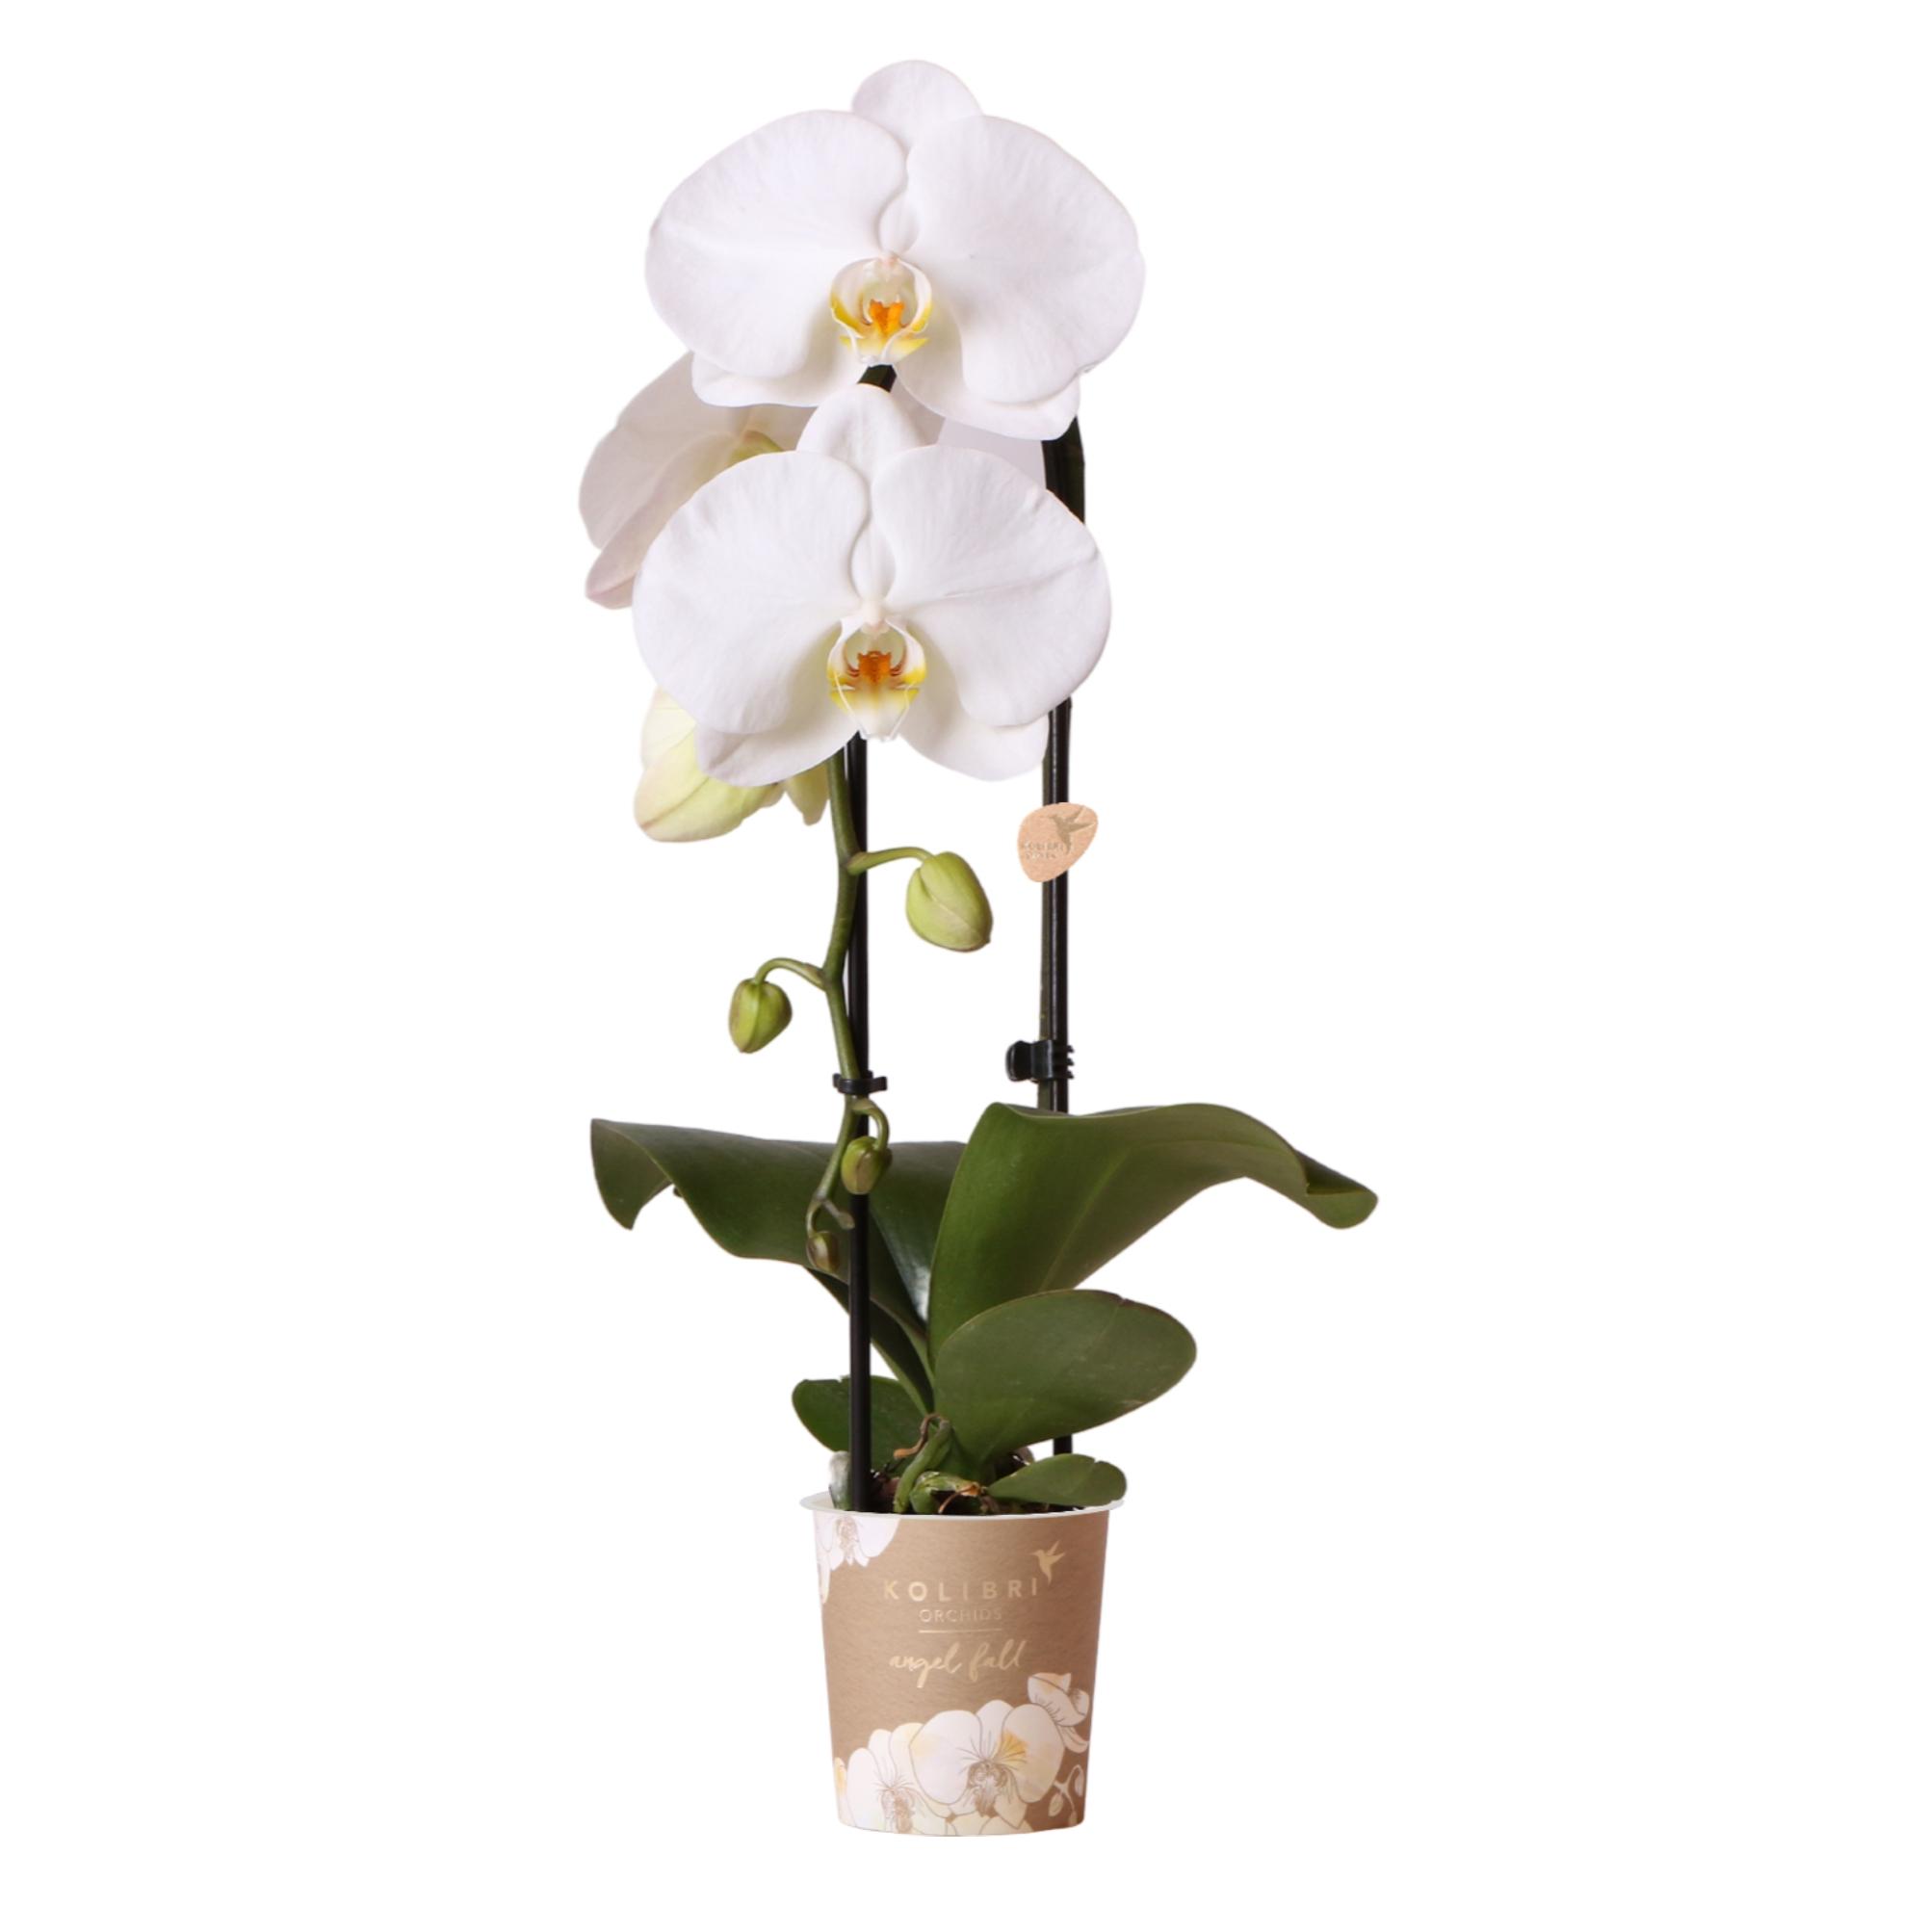 Kolibri Company - Kolibri Orchids Angel Fall white 9cm orchidee kopen